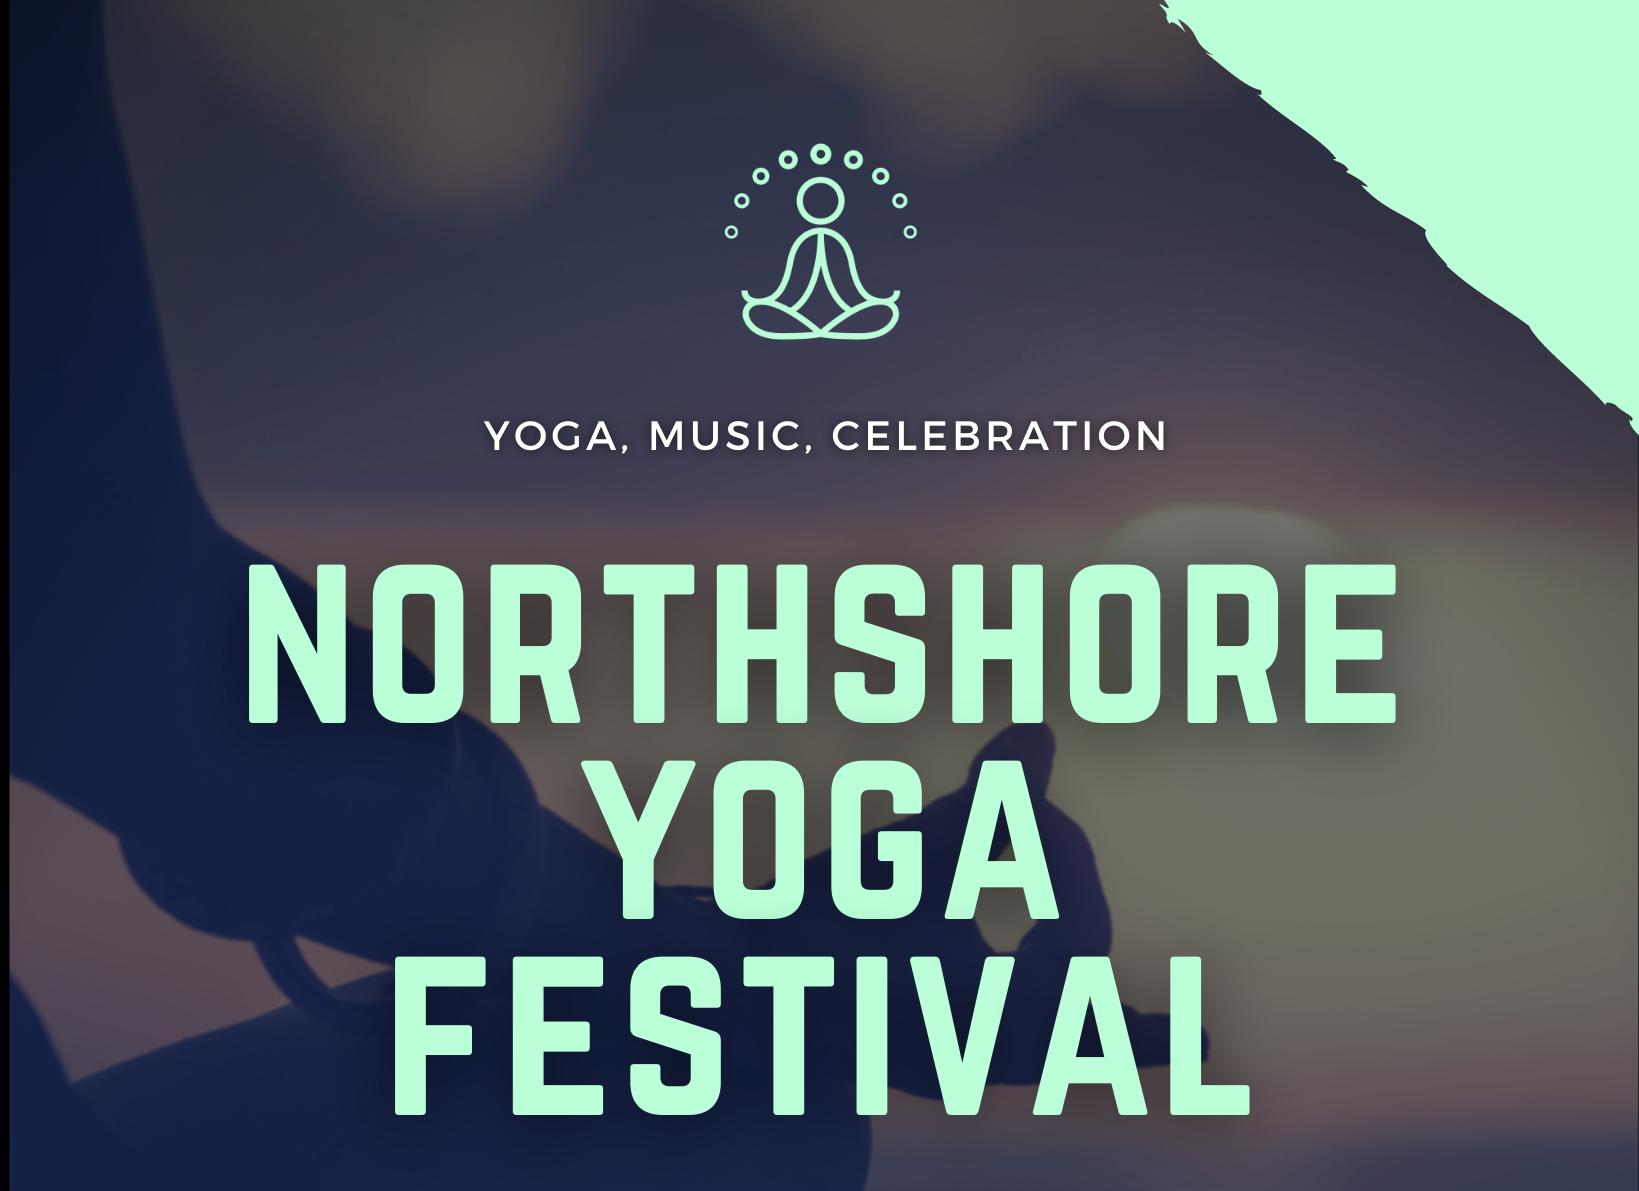 Northshore Yoga Festival With Seán